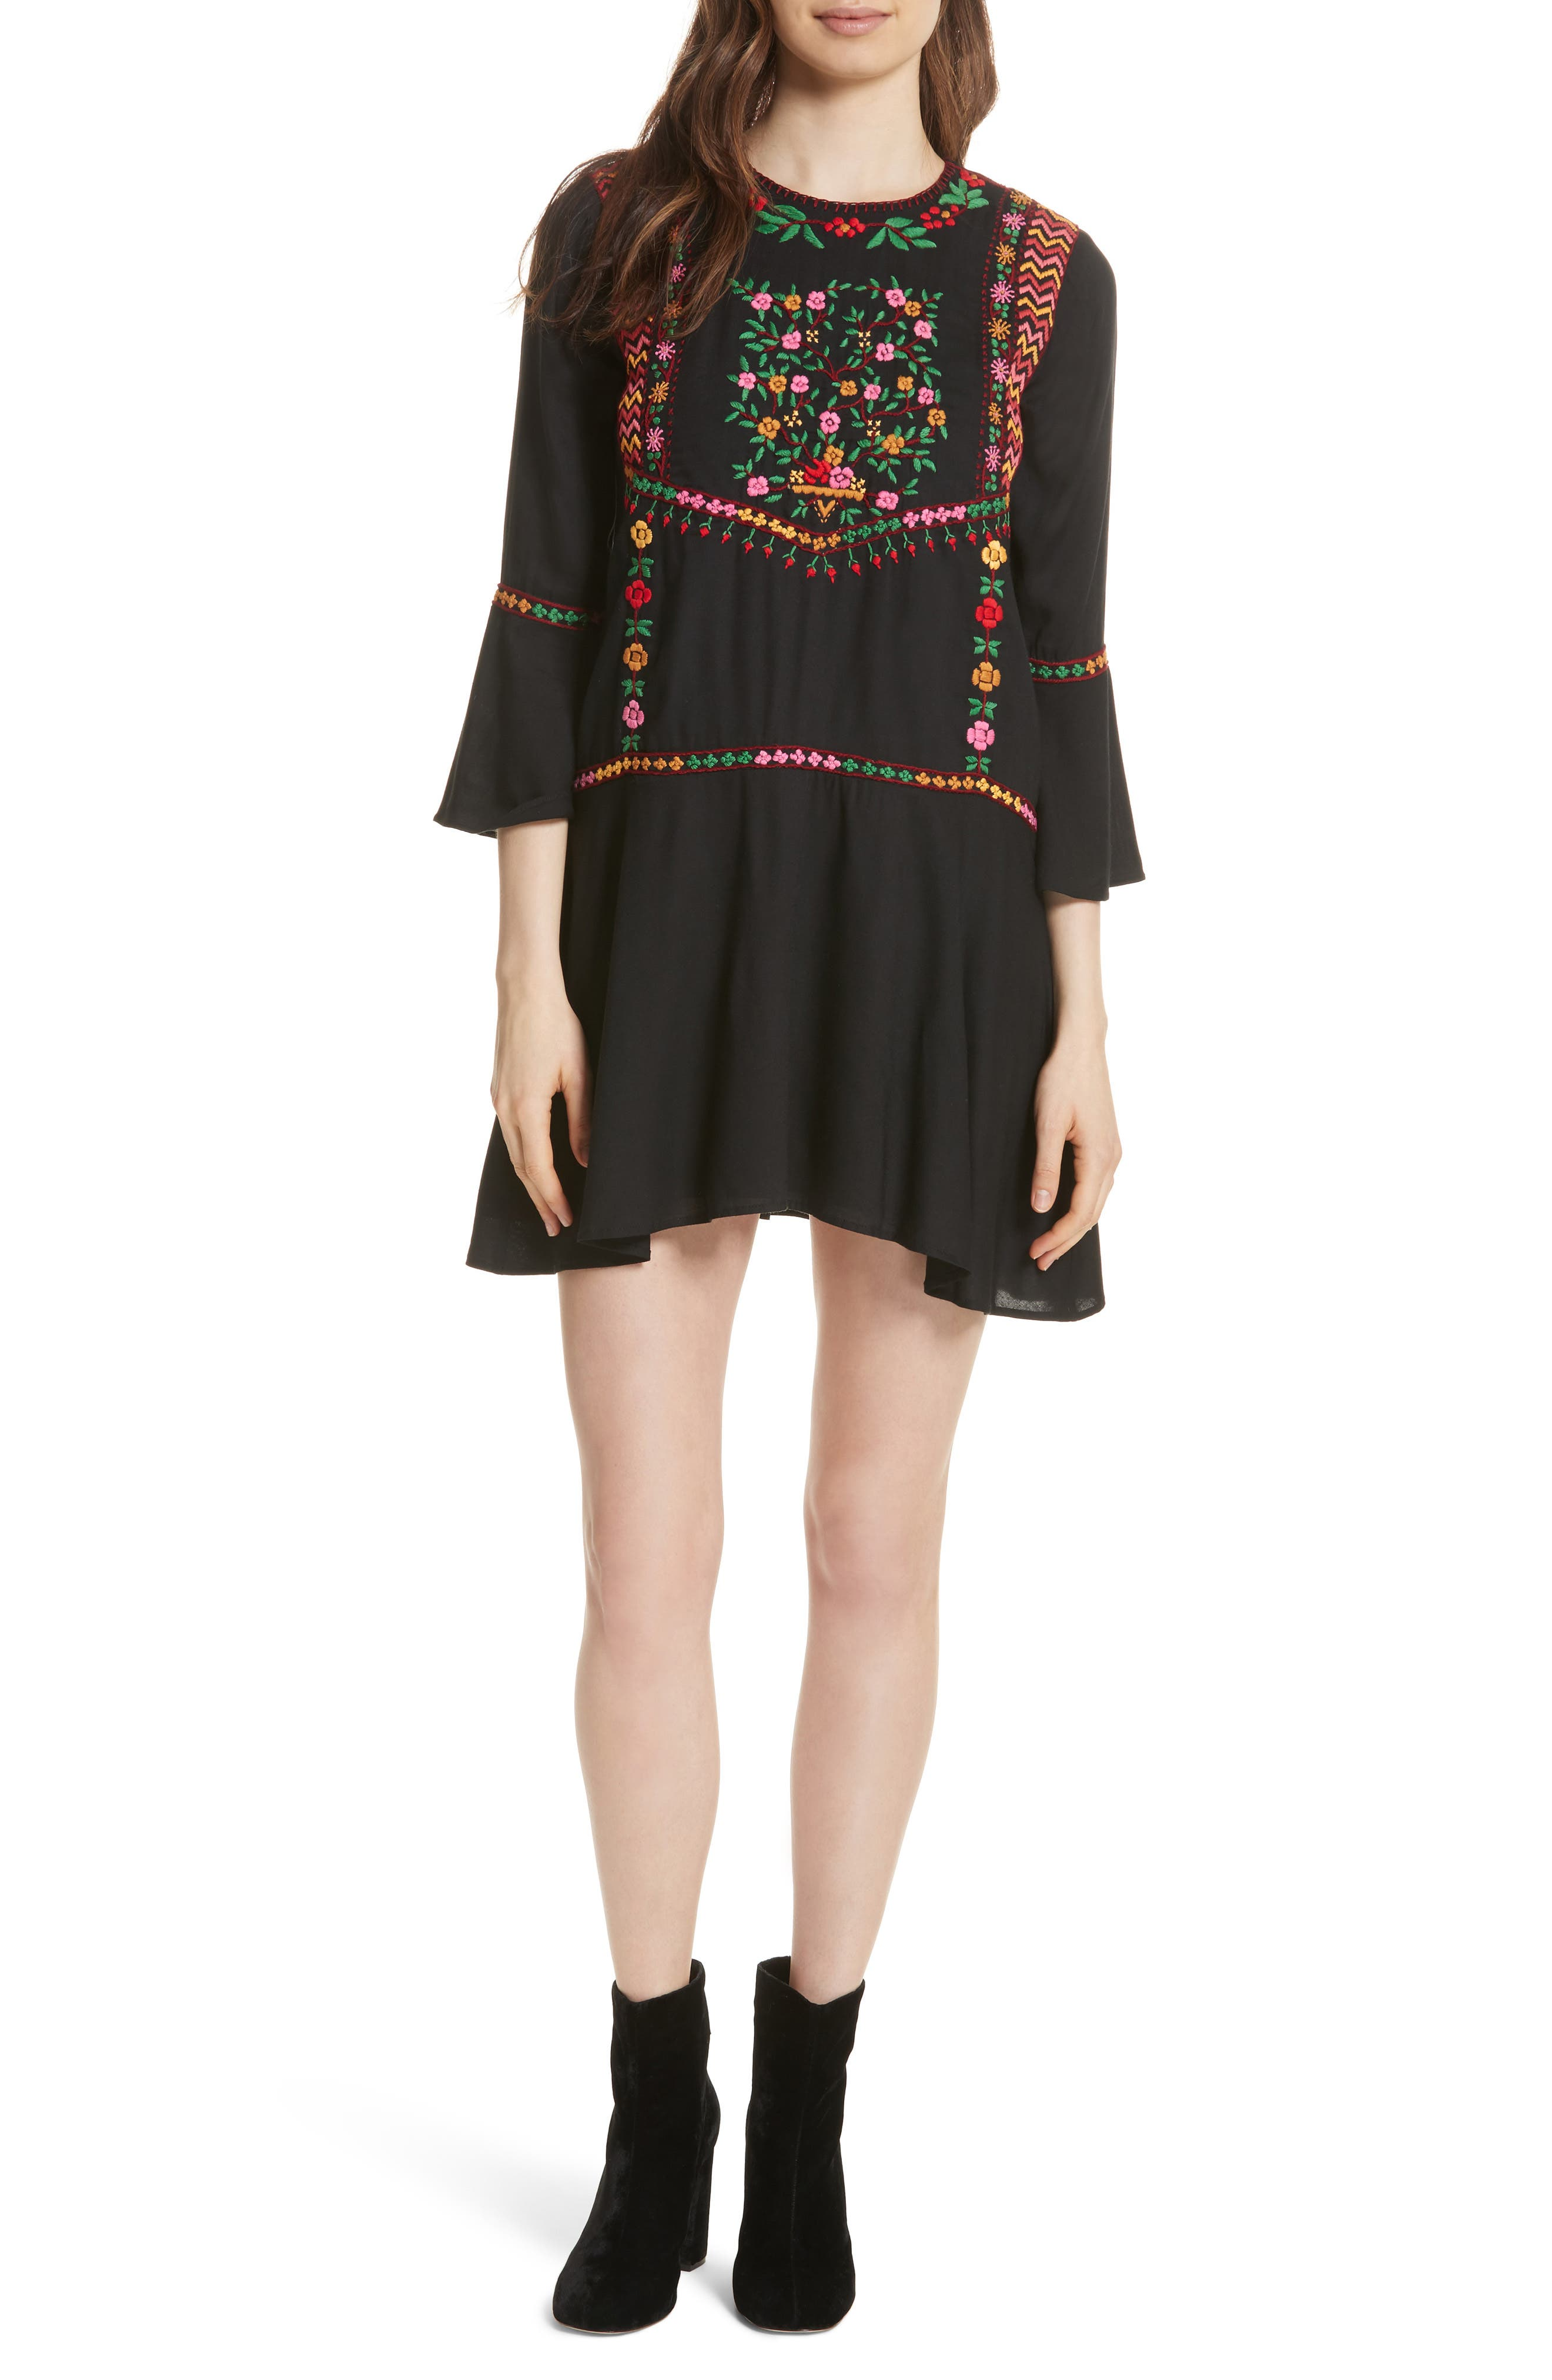 Gosinda Embroidered Dress,                             Main thumbnail 1, color,                             009